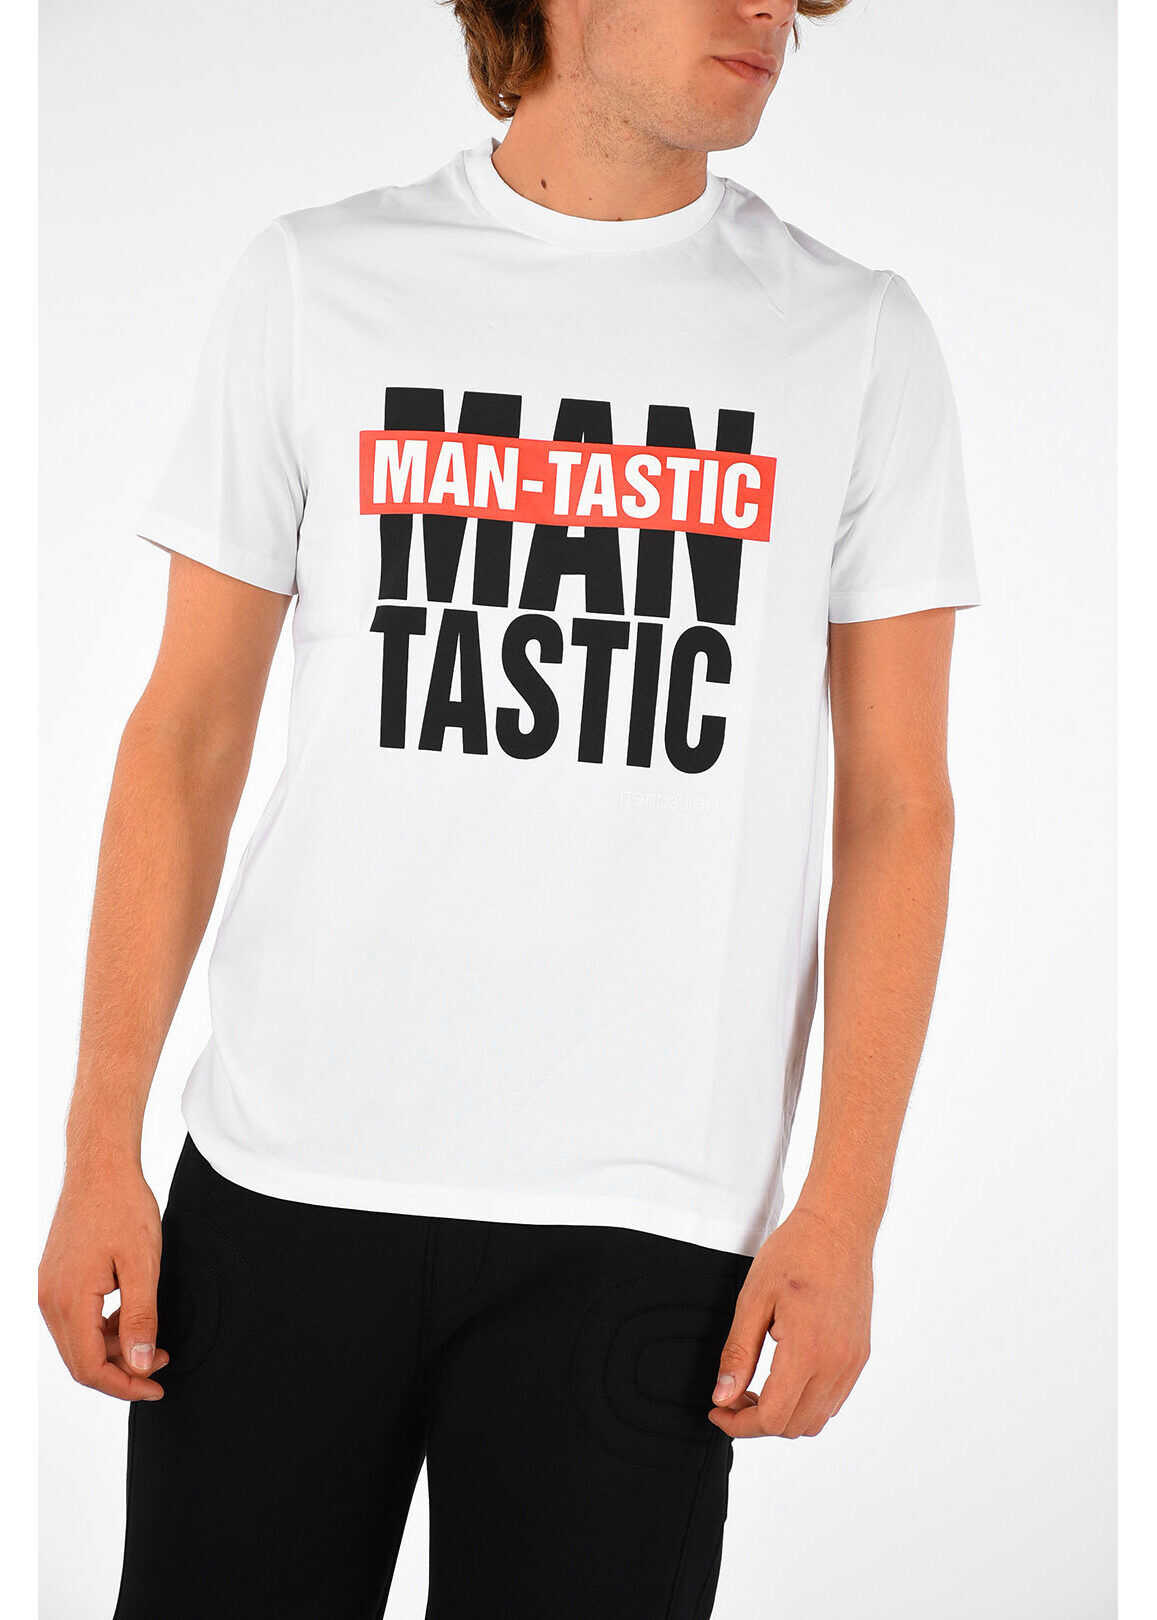 MAN-TASTIC Printed T-shirt